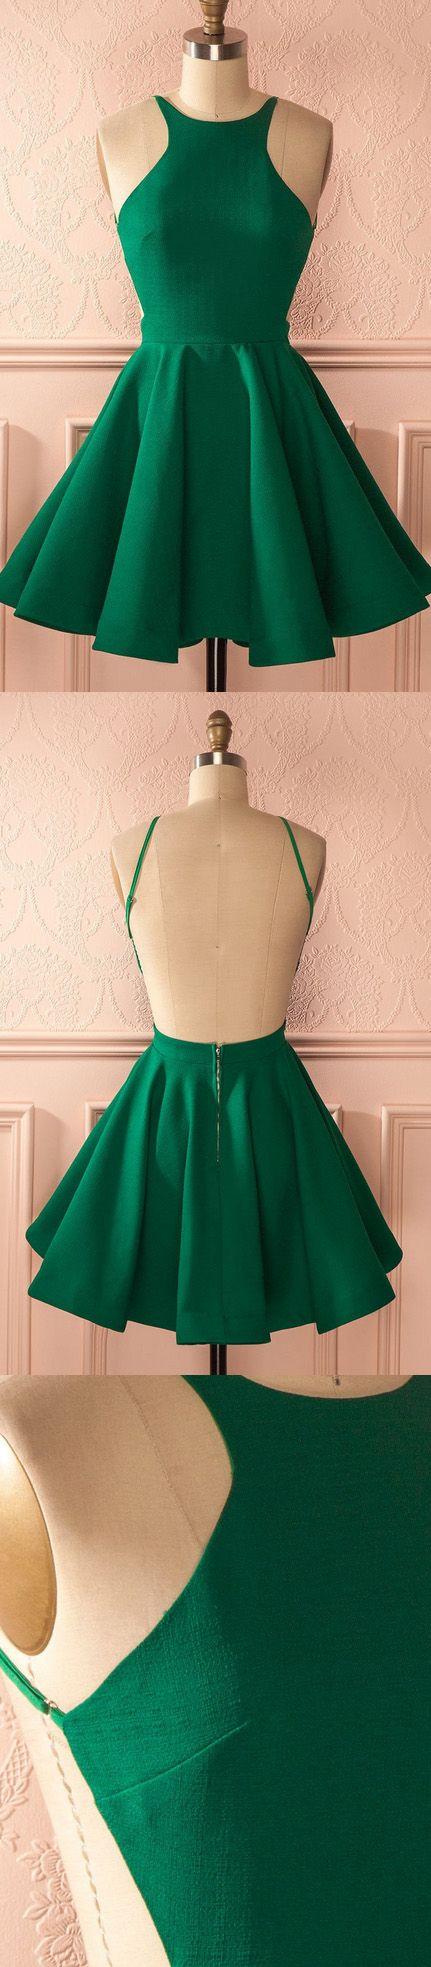 Short prom dresses sexy prom dresses green prom dresses prom